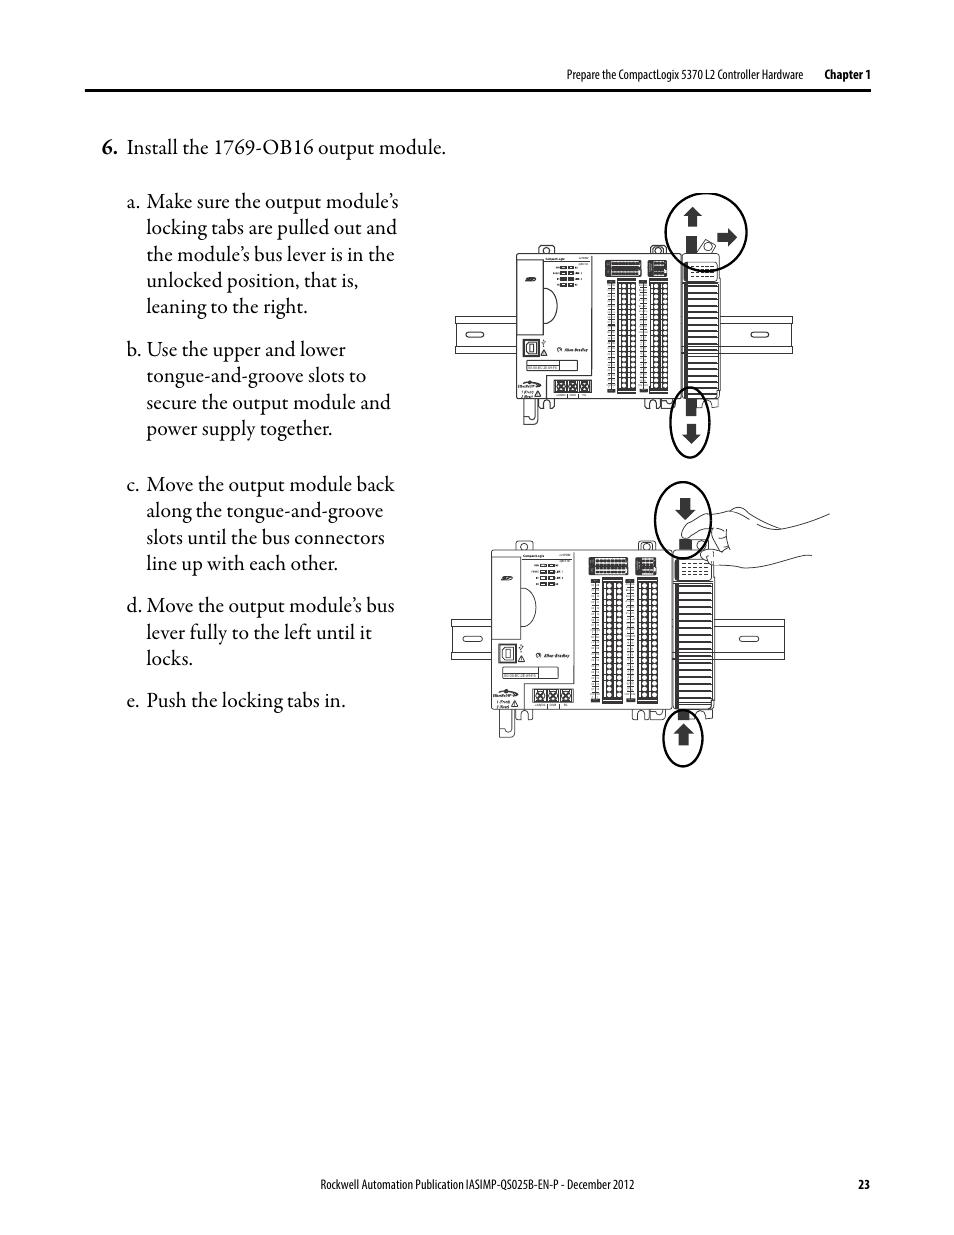 1769 l24er qbfc1b manual on